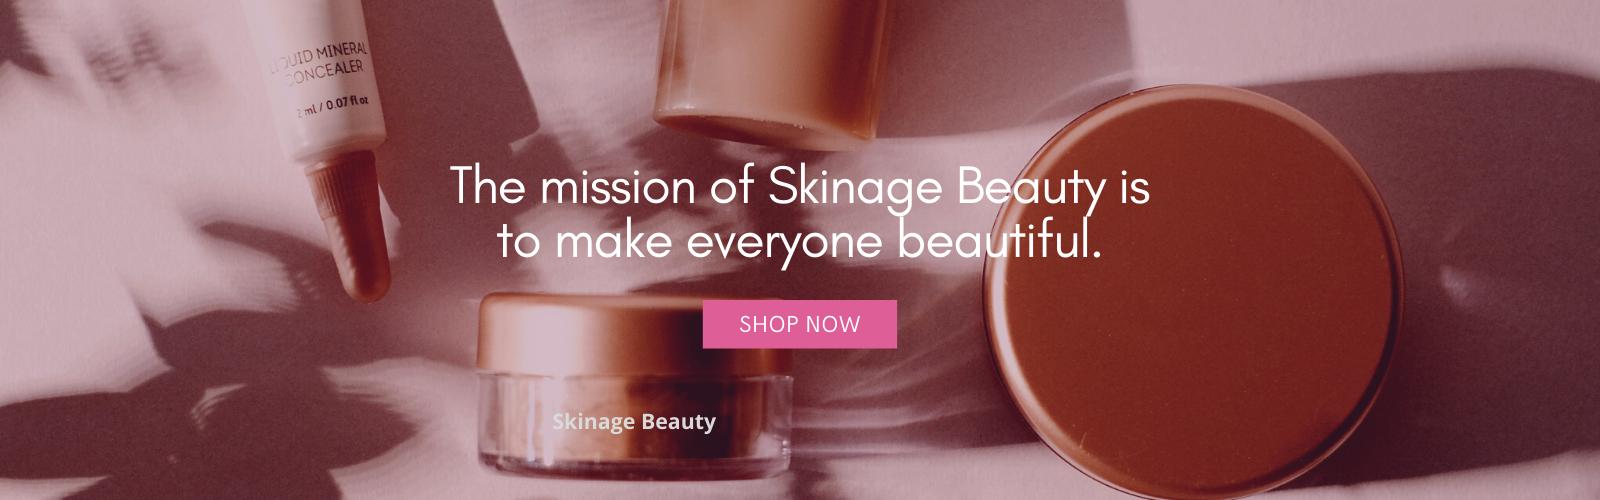 Skinage Banner 2